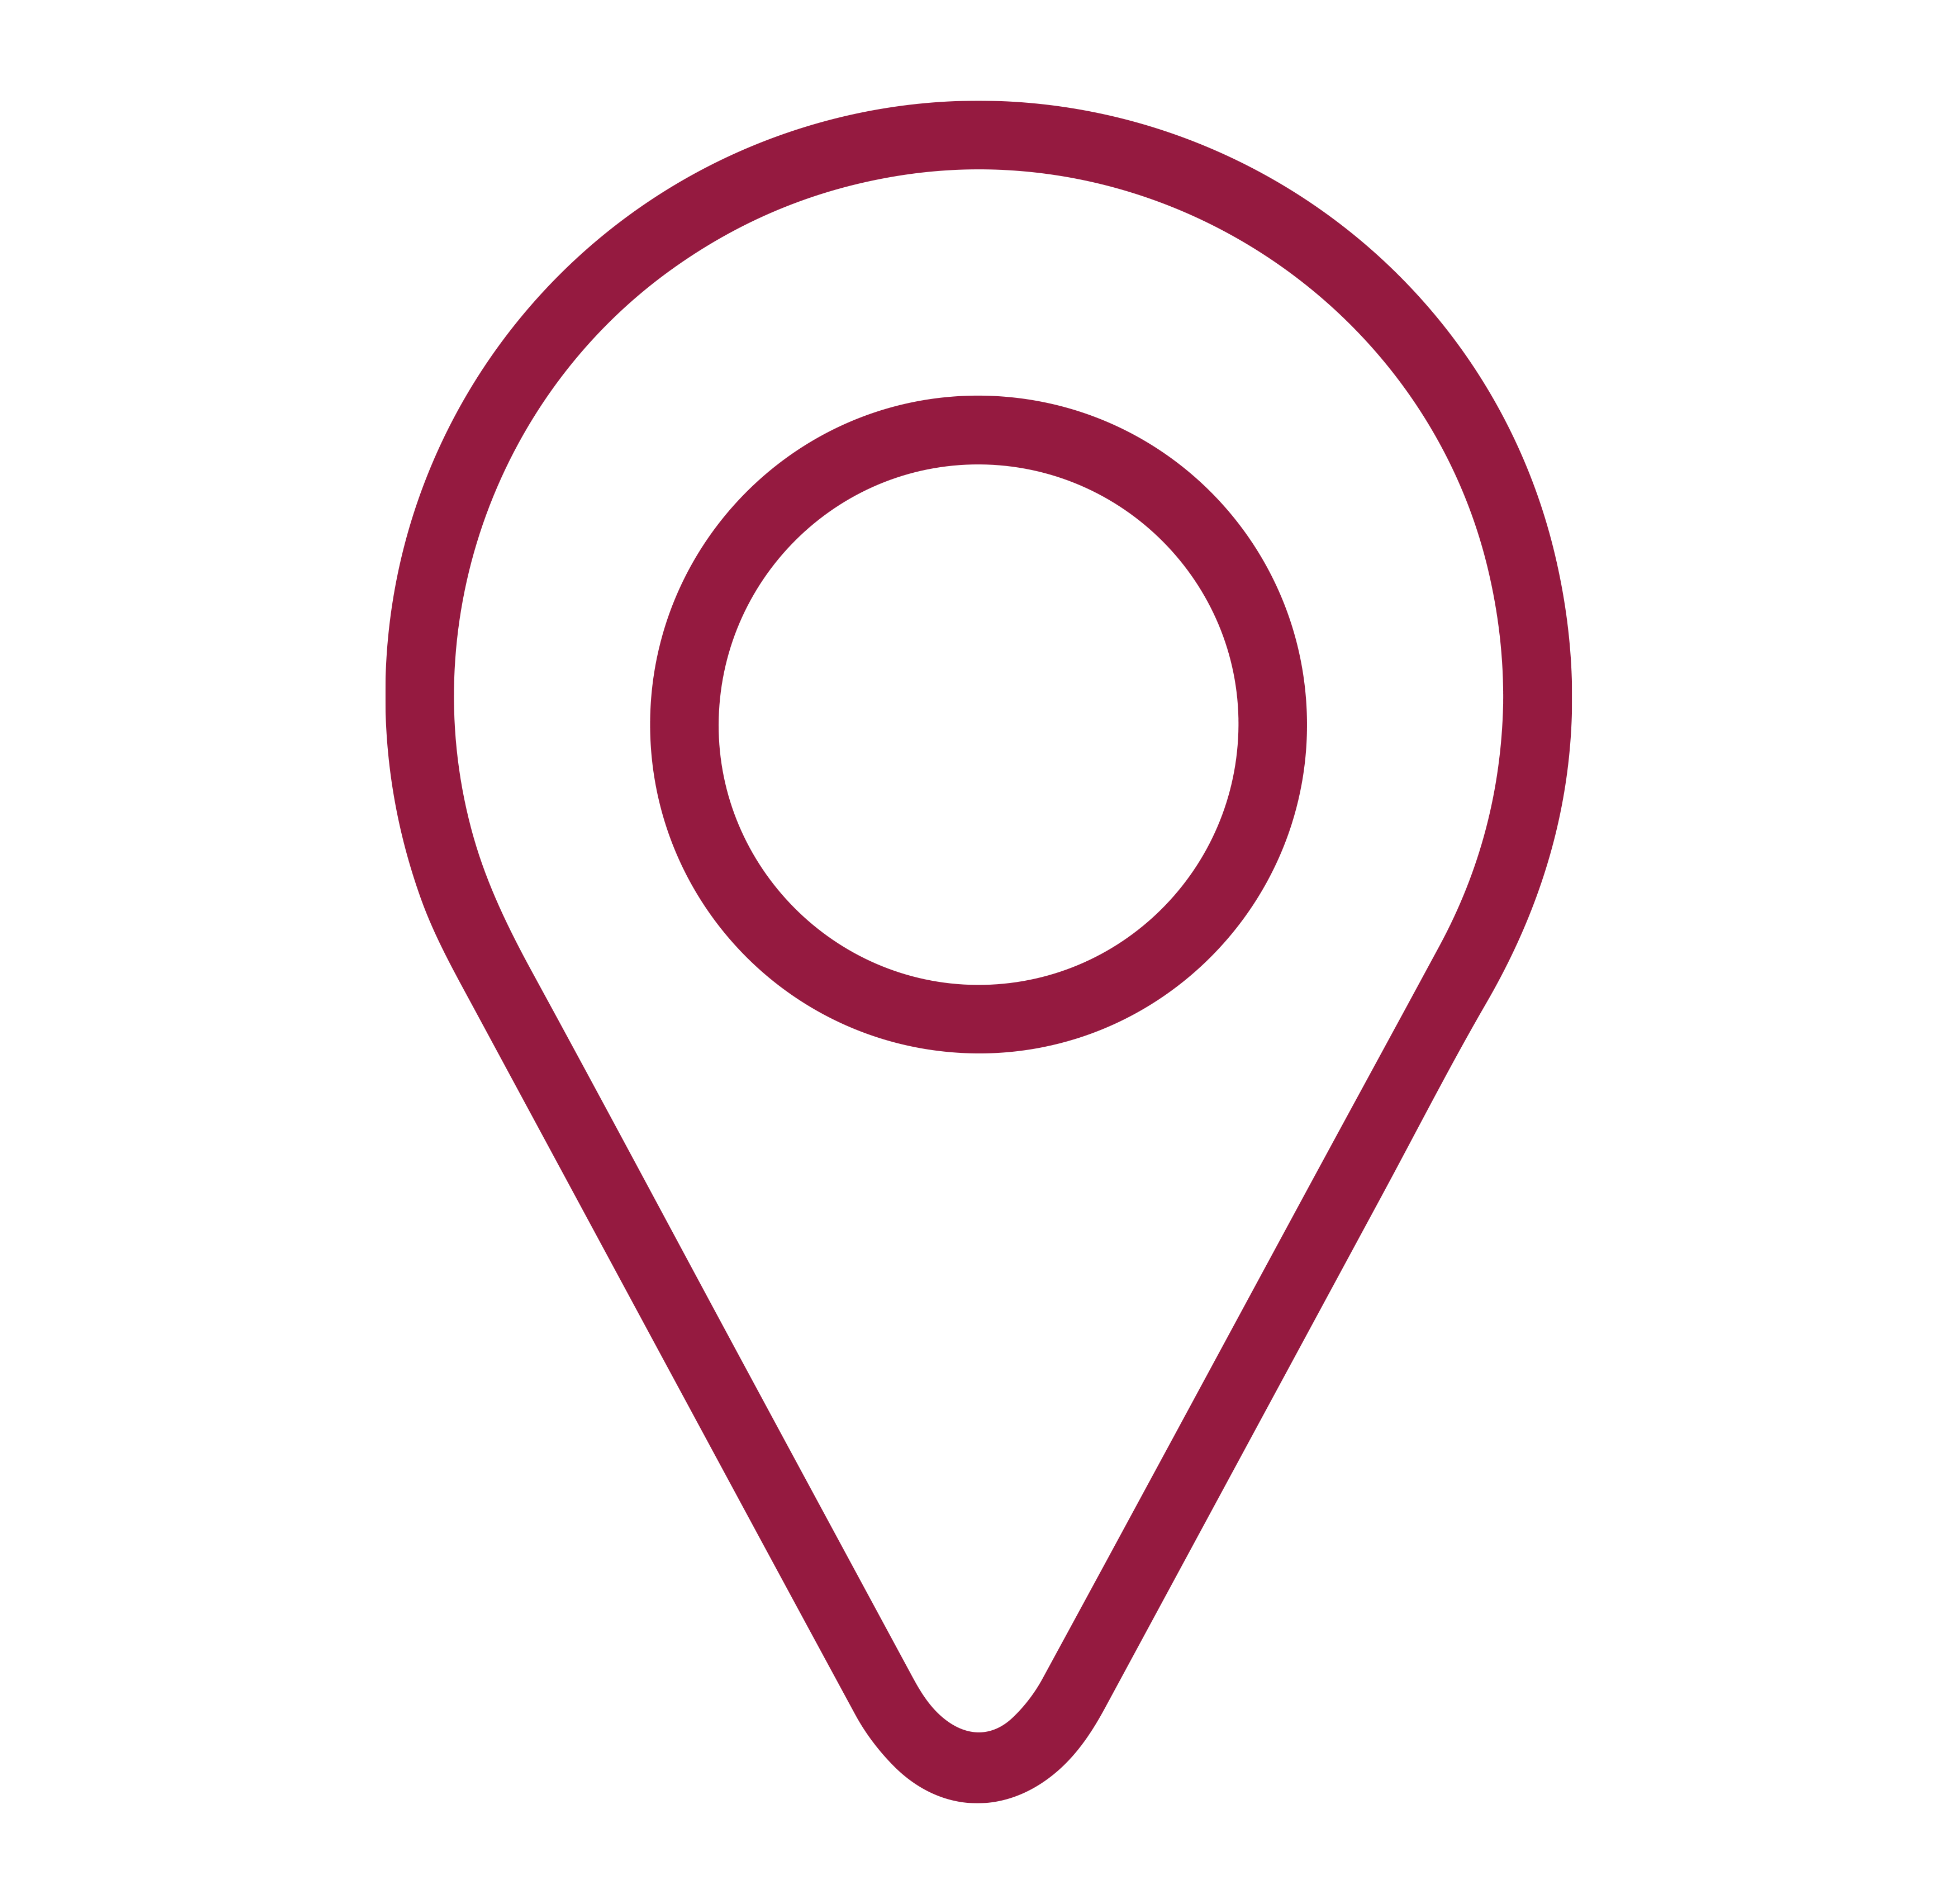 INBOUND - ubicación